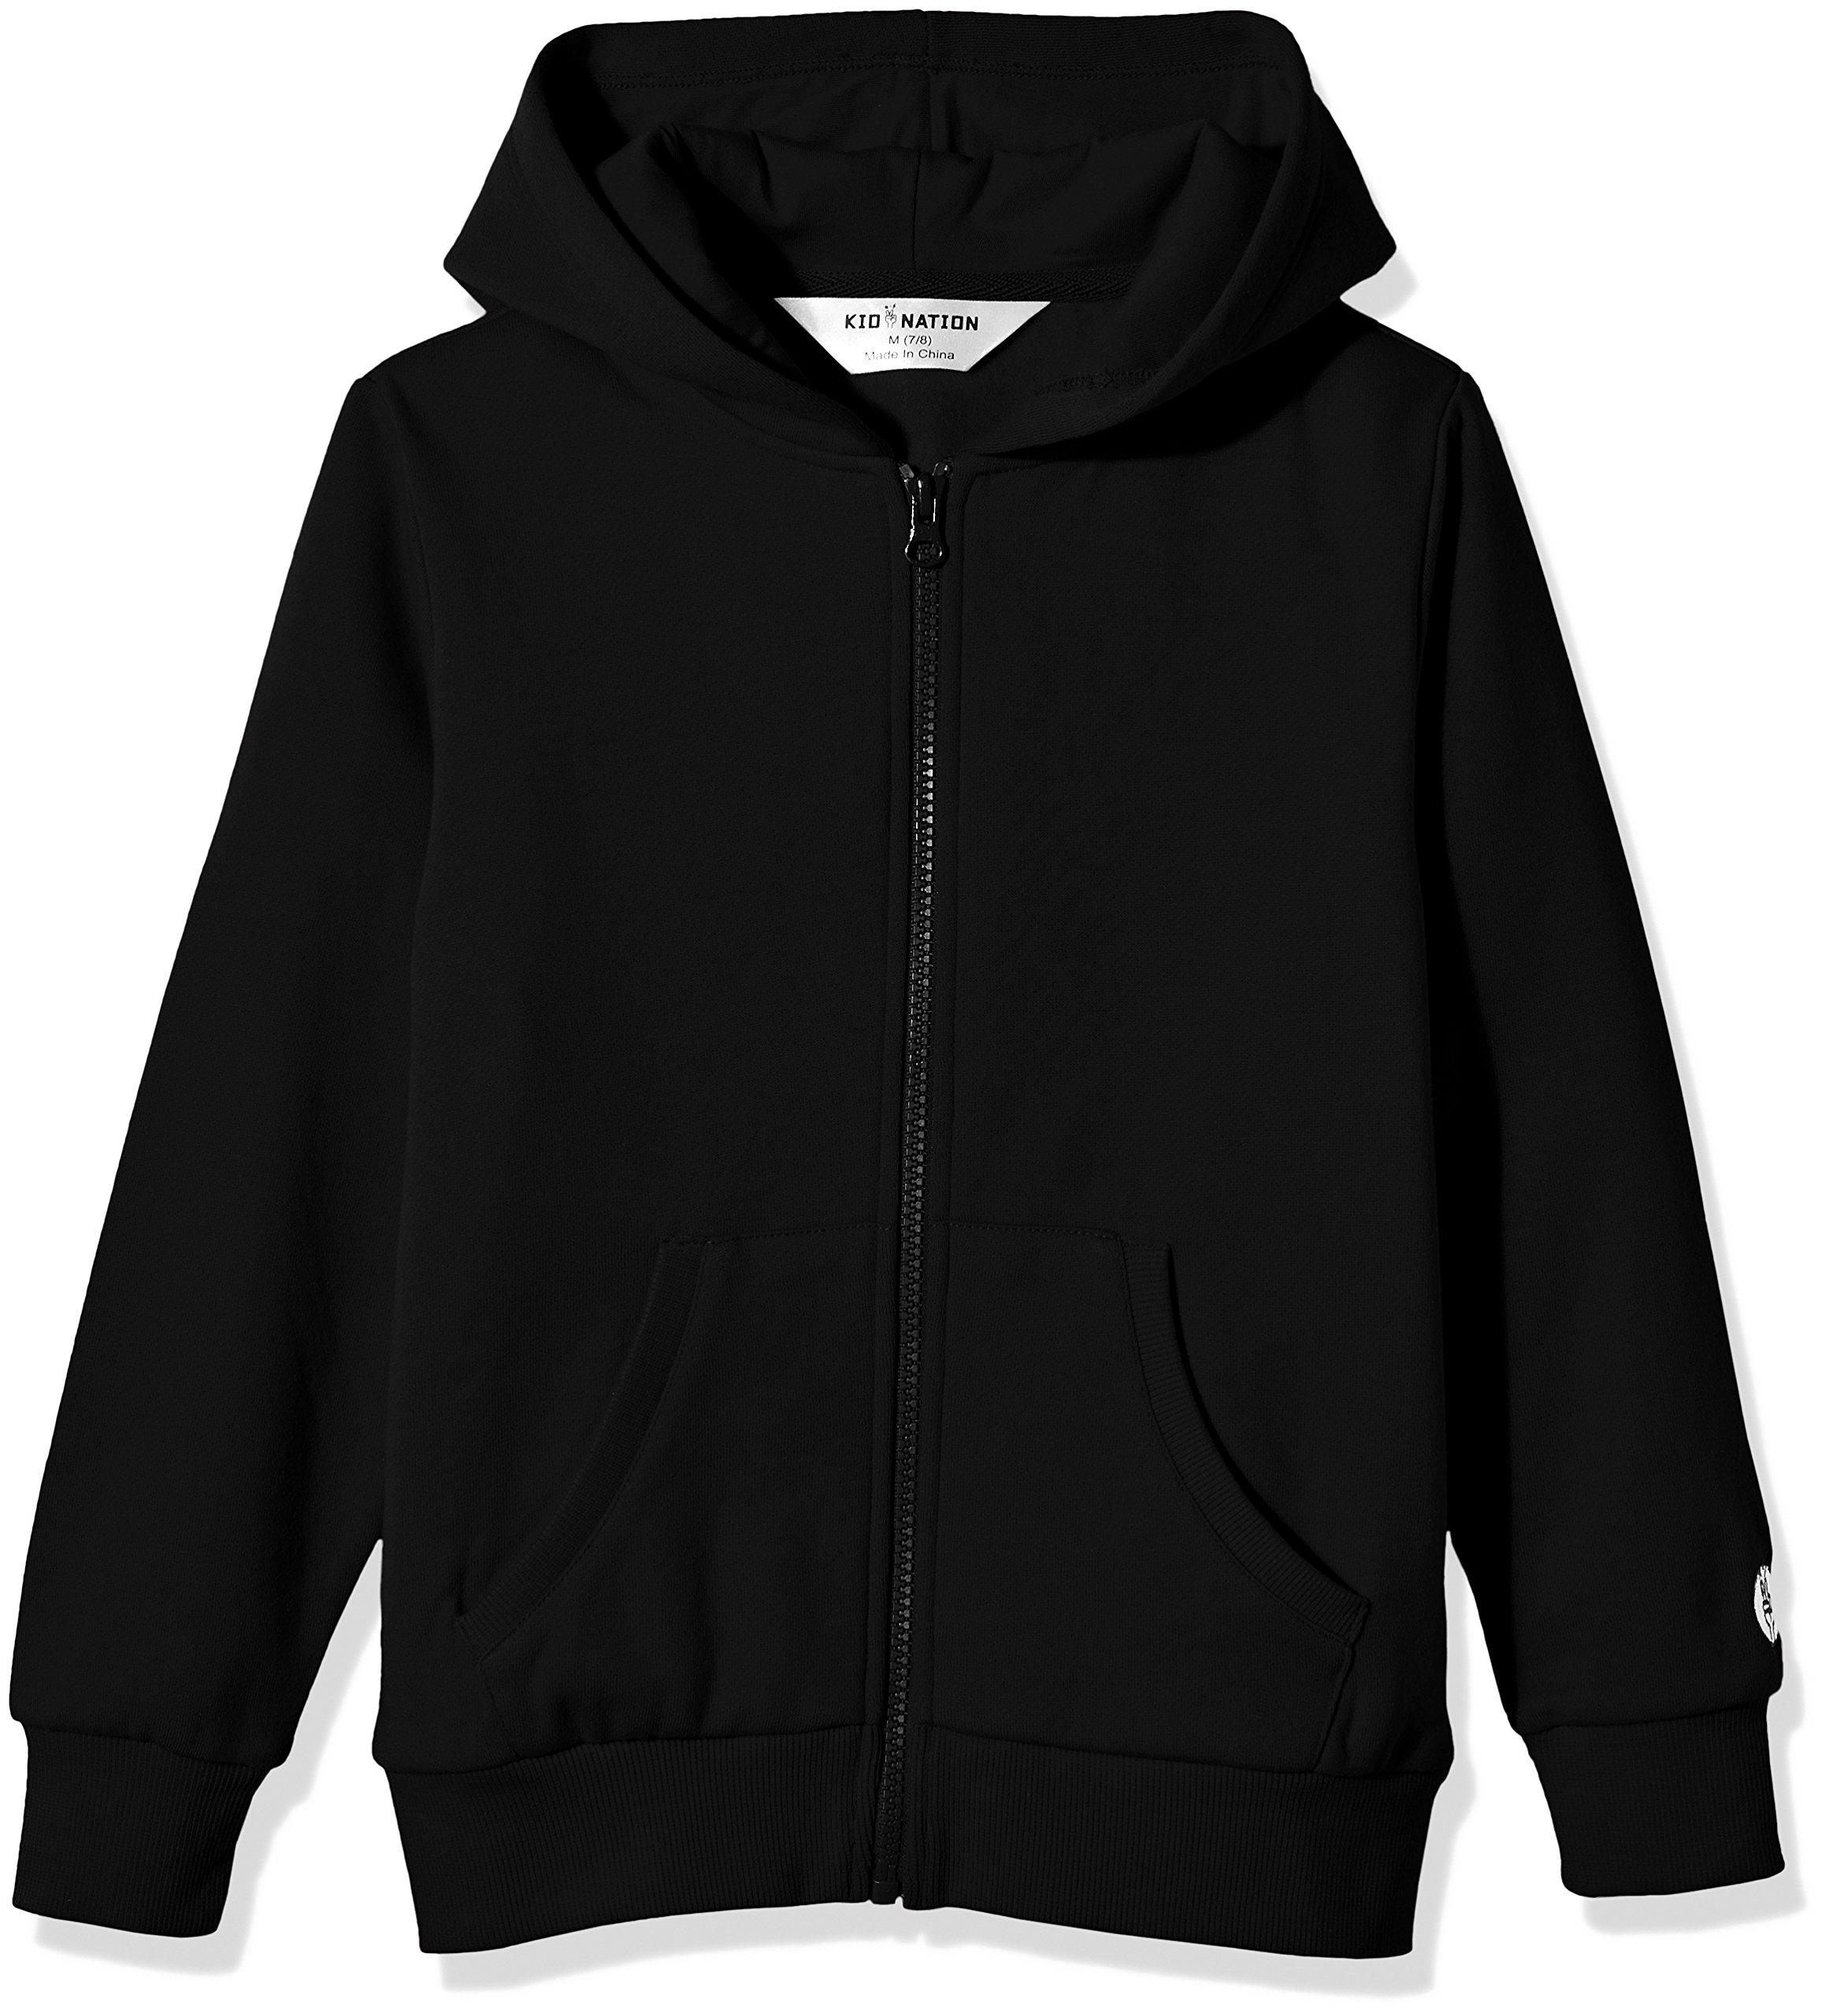 Kid Nation Kids' Brushed Fleece Zip-up Hooded Sweatshirt for Boys Girls M Black